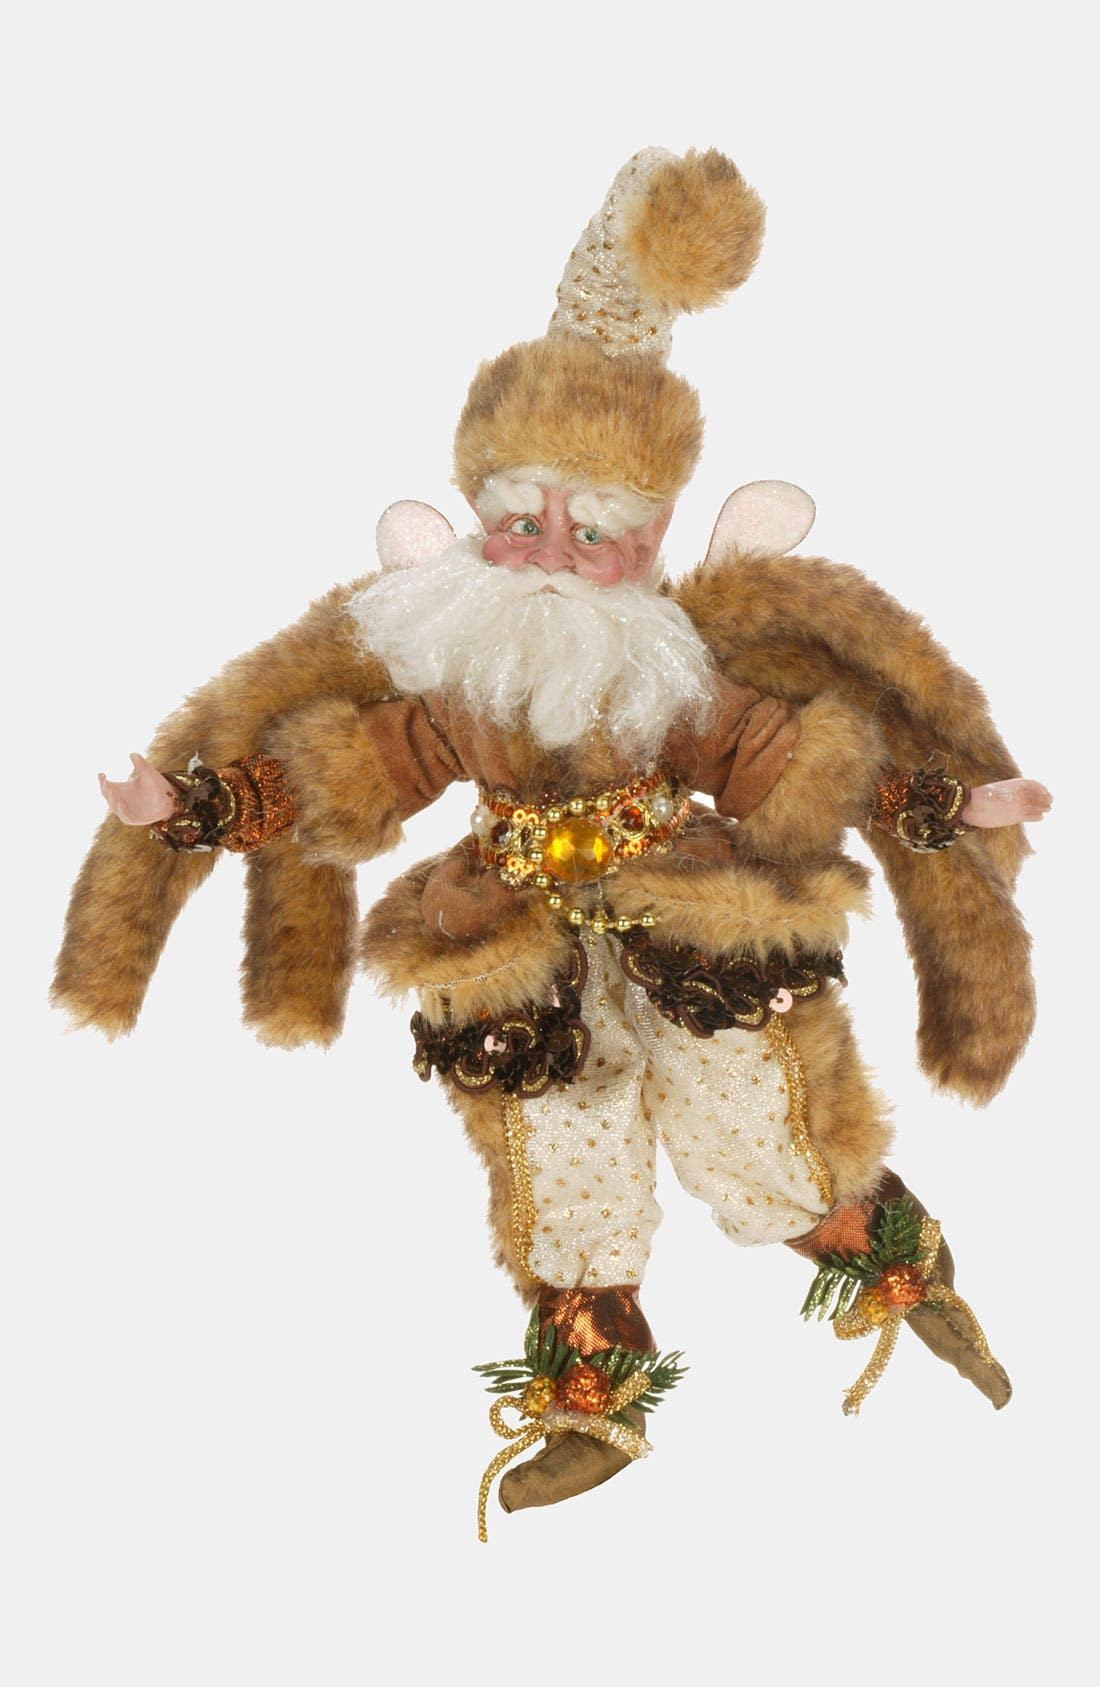 Alternate Image 1 Selected - Mark Roberts 'Northwoods Fairy' Figurine (Limited Edition)